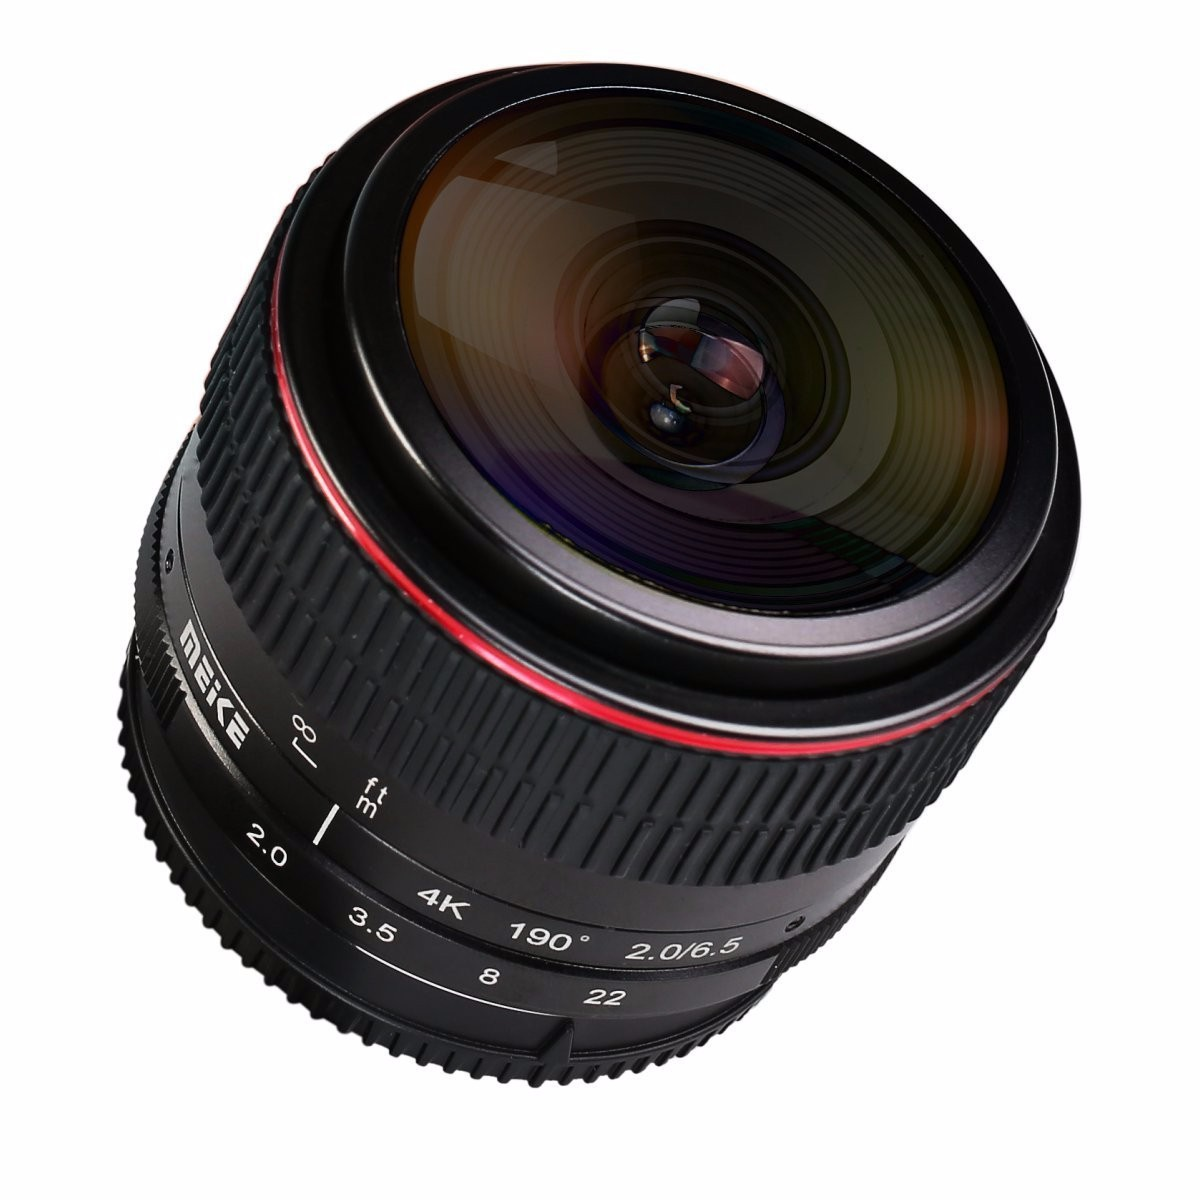 MEIKE MK-6.5mm F2.0 Fisheye Lens for Panasonic/Olympus Mirrorless MFT M4/3 Lens Camera мясорубка panasonic mk g1800pwtq